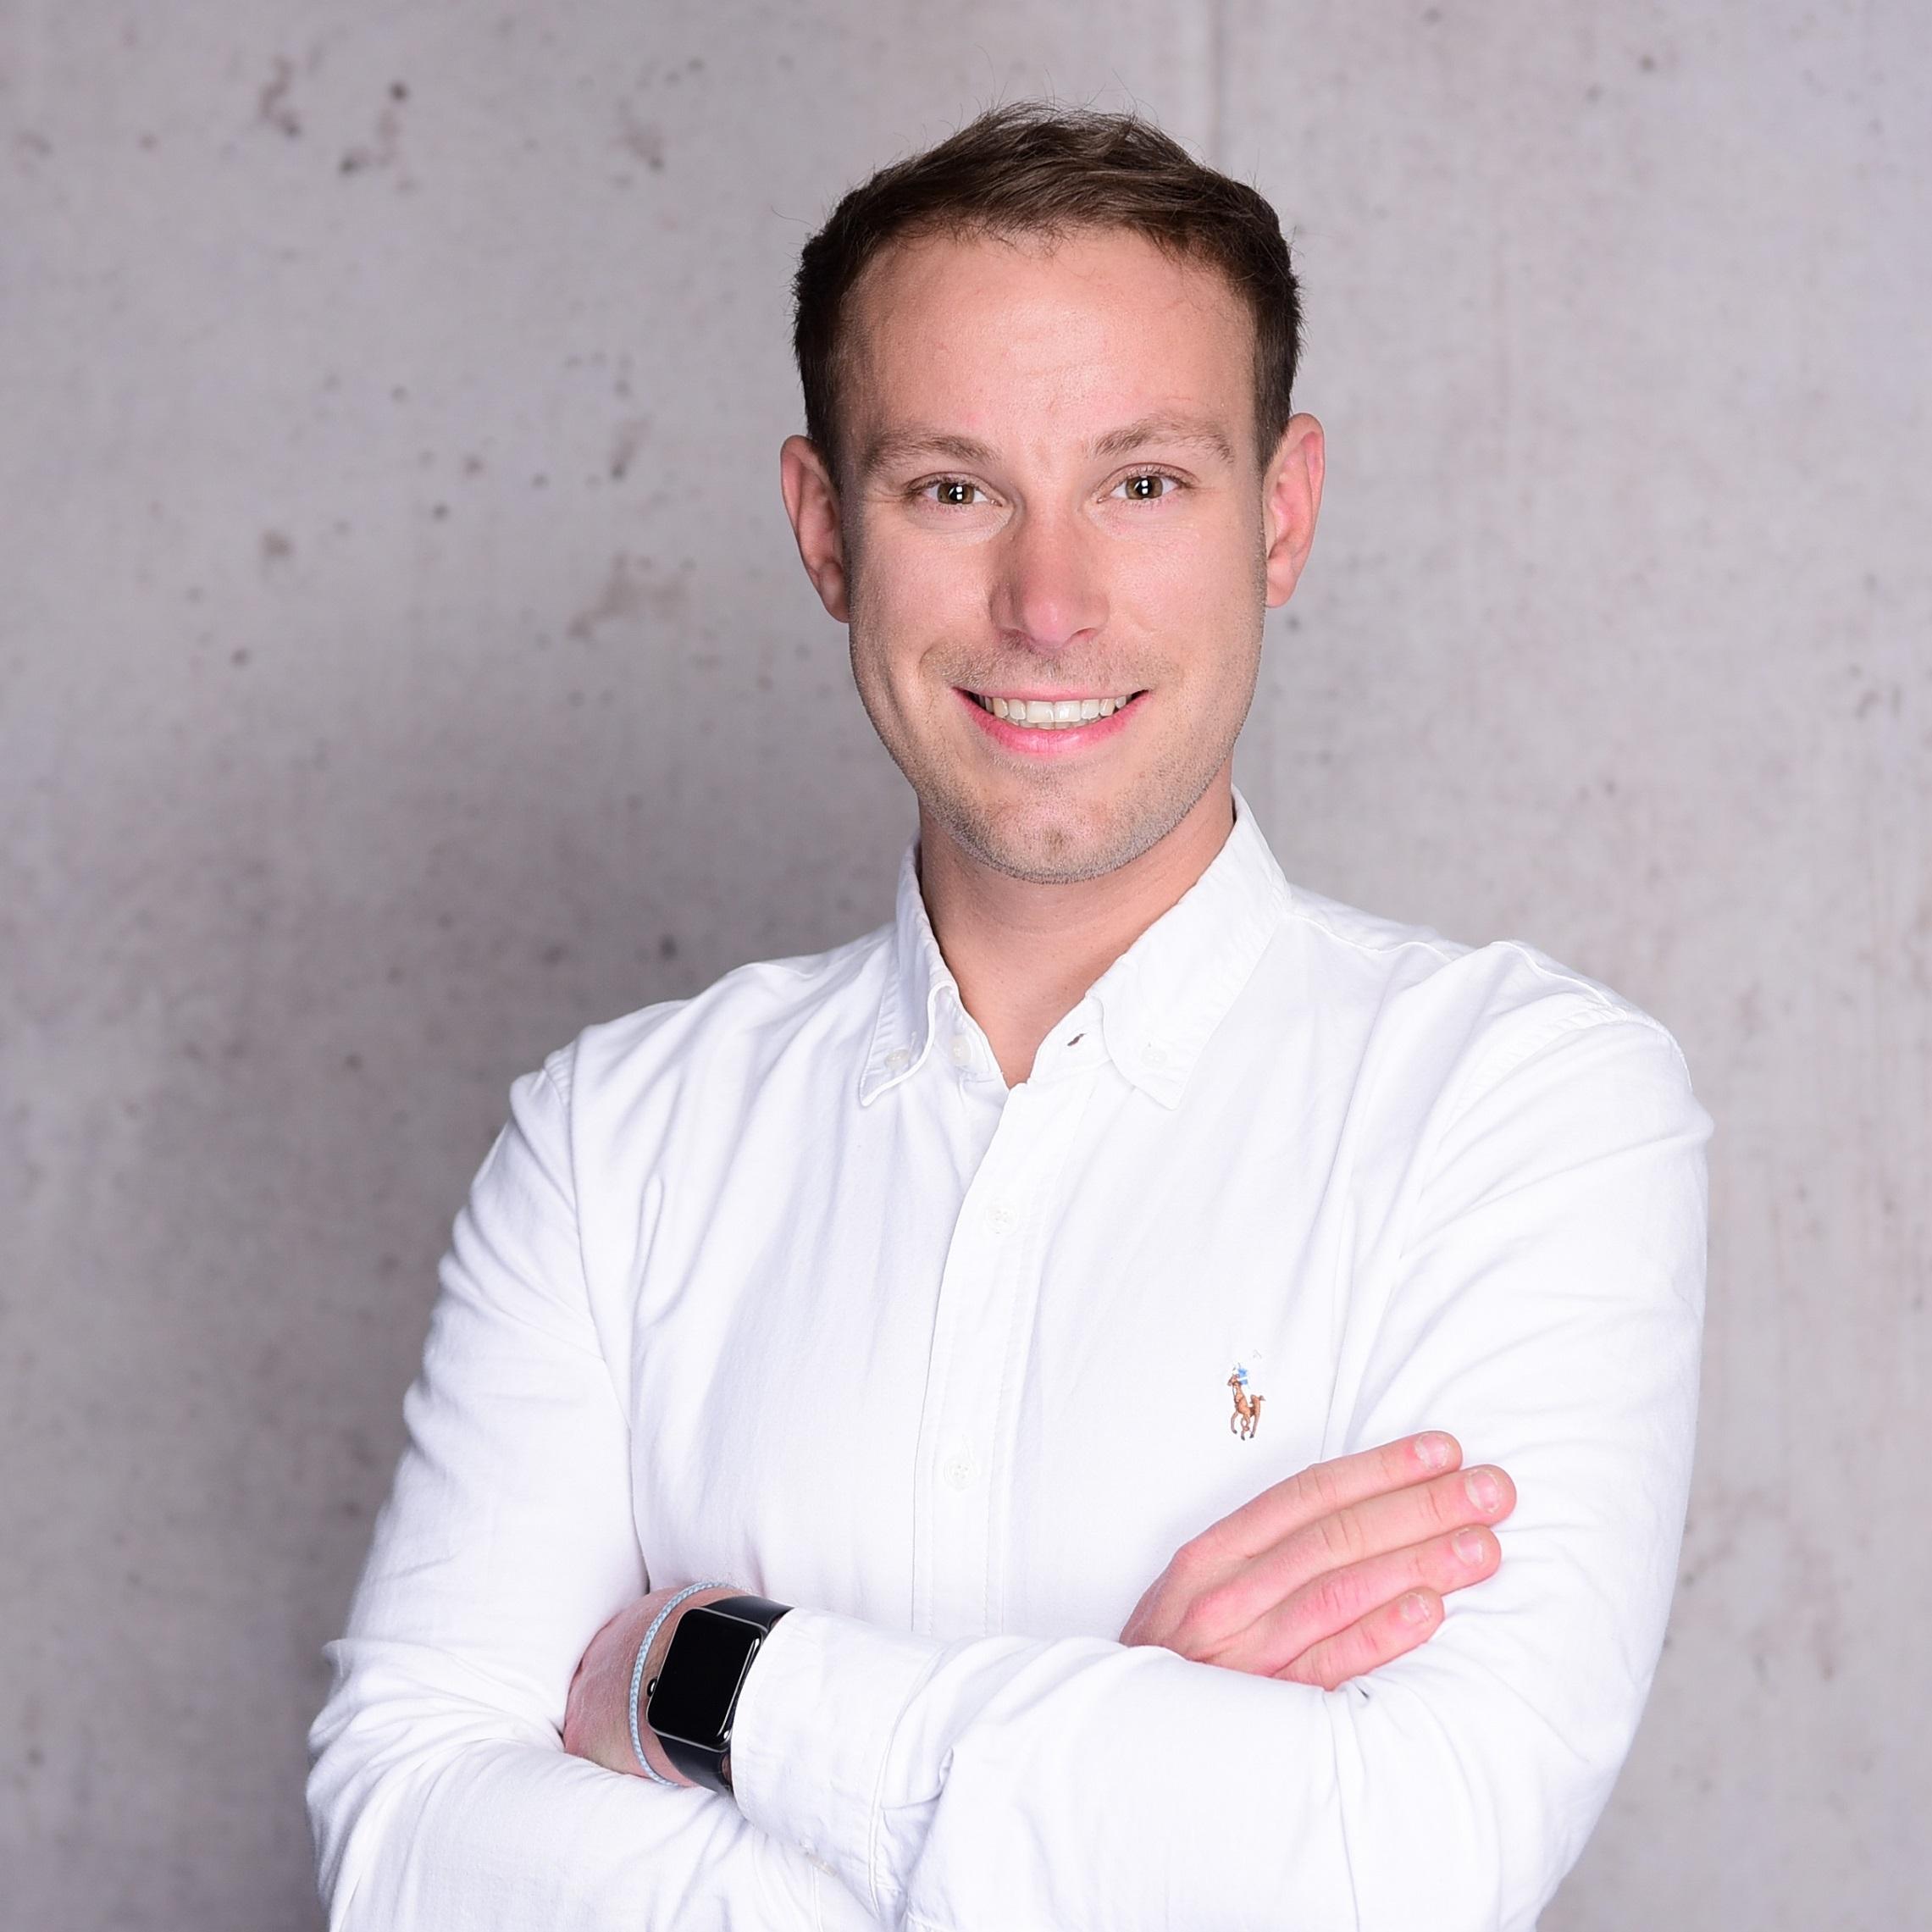 Johannes Herberger, Trainer, Amazon